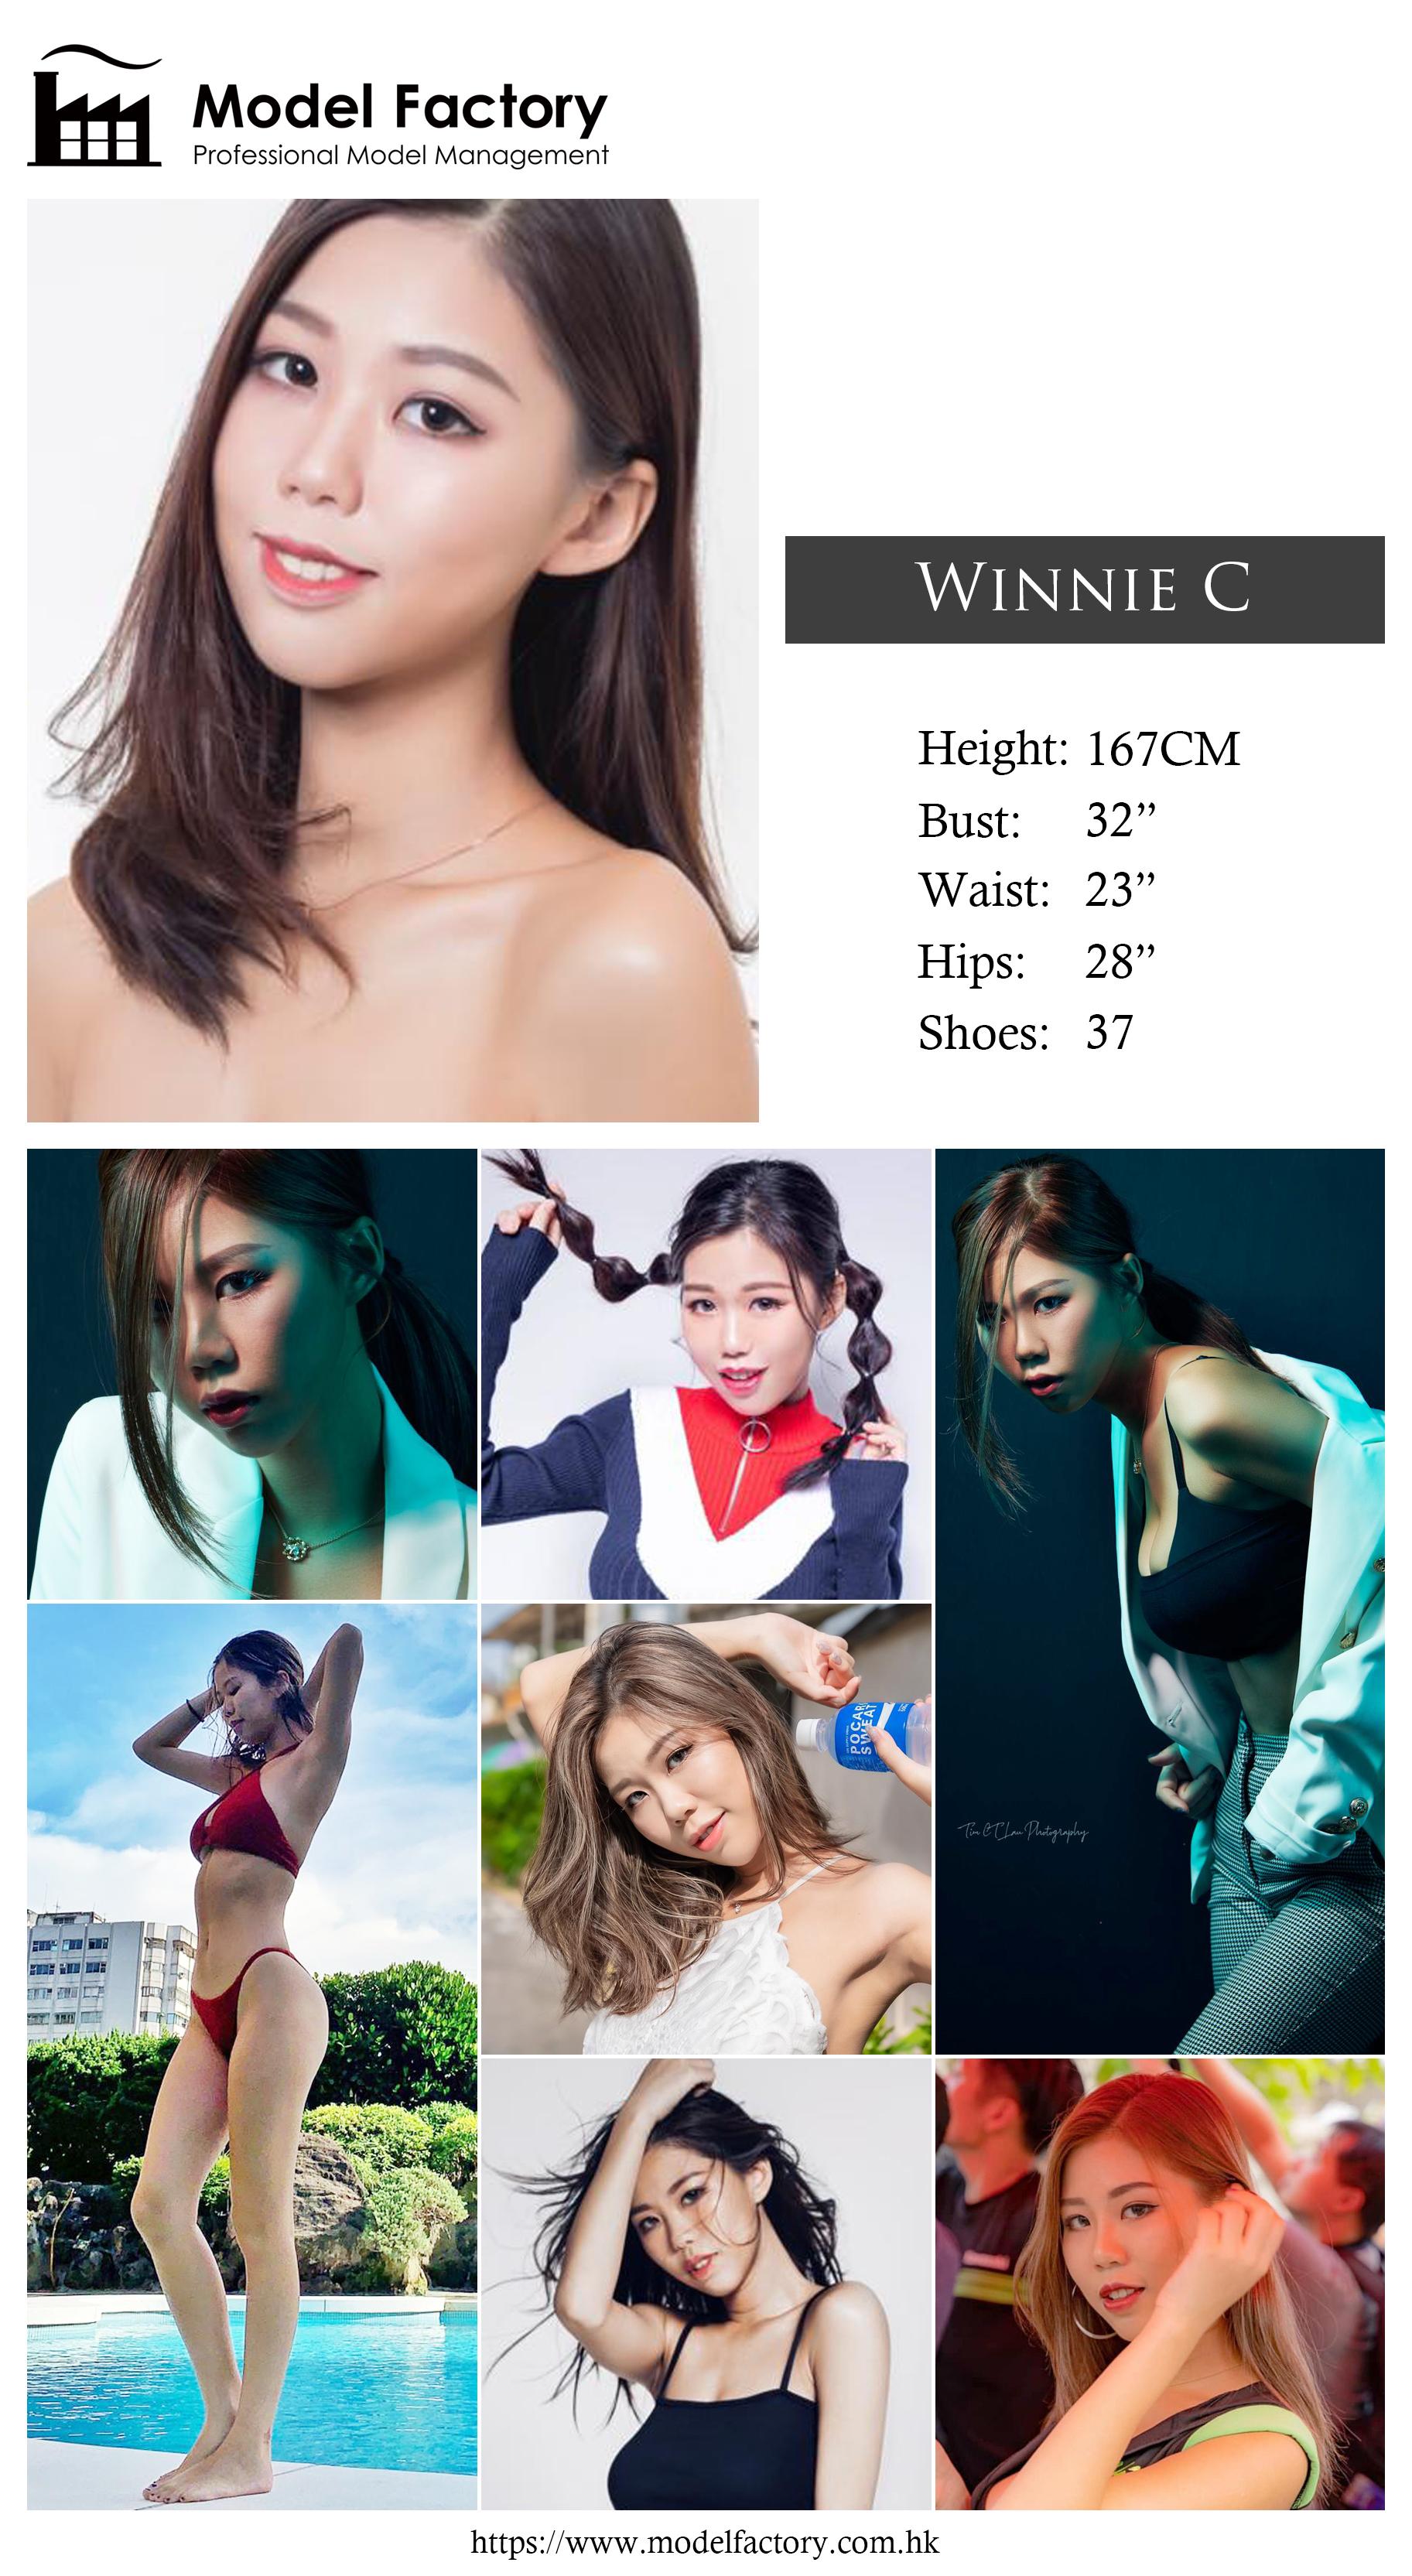 Model Factory Hong Kong Female Model WinnieC